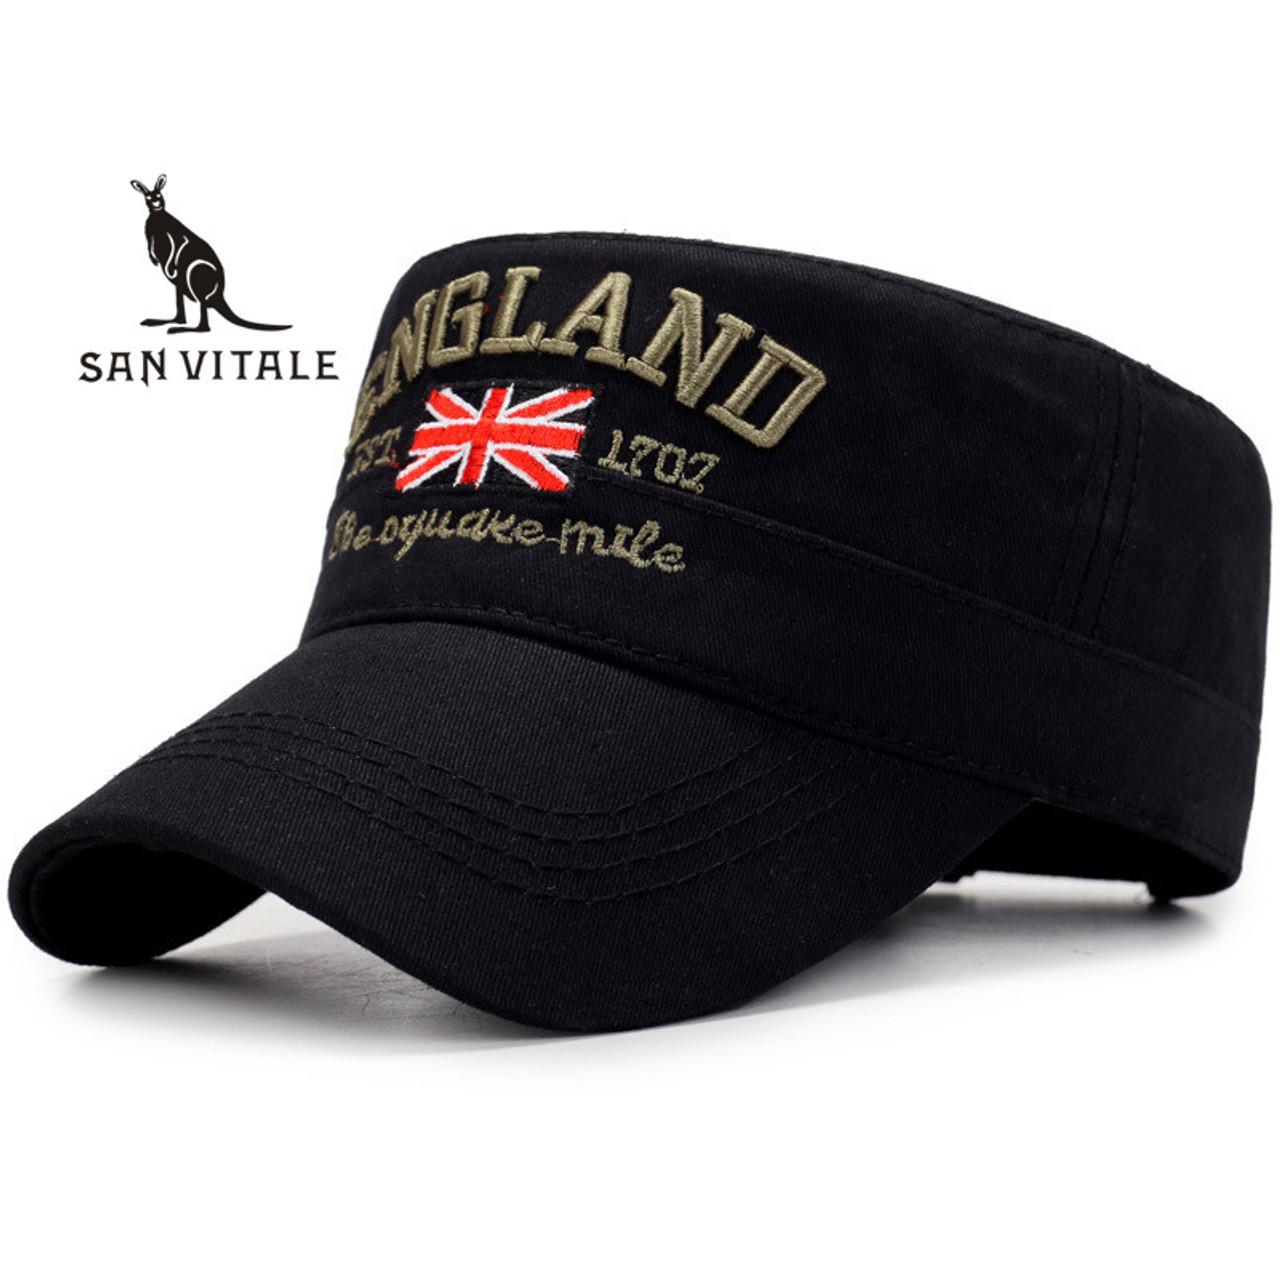 ac101eefc2538 Wholesale Spring Cotton Cap Baseball Cap Snapback Hat Summer Cap Hip Hop  Fitted Cap Hats For Men Women Grinding Multicolor